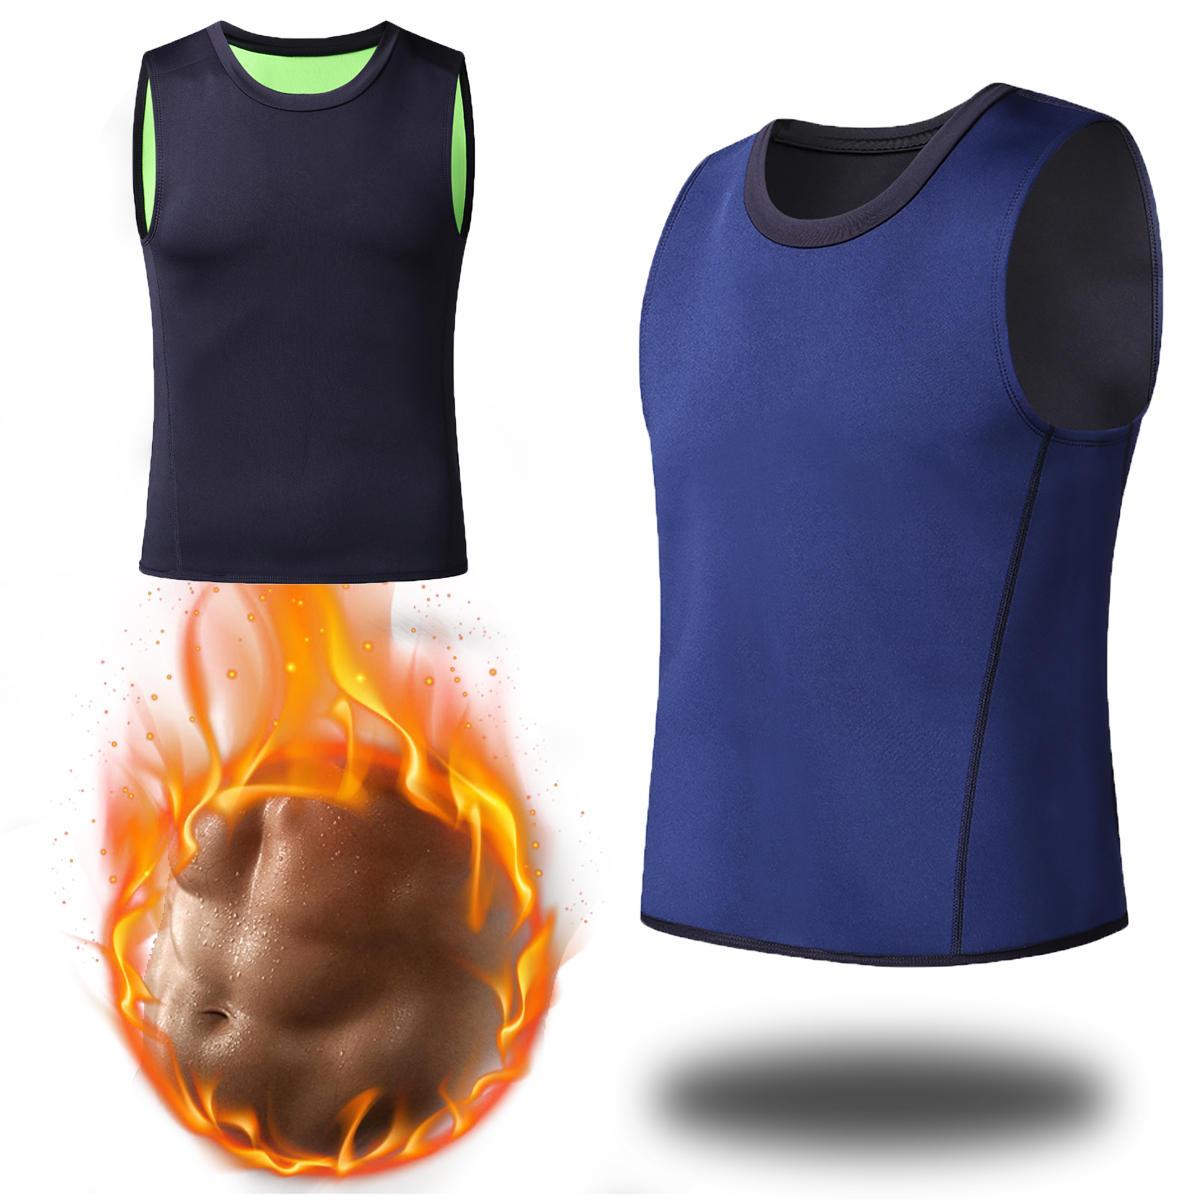 Men Slim Body Shaper Vest Neoprene Sport Sauna Sweat T-Shirt Fat Burning Waist Trainer